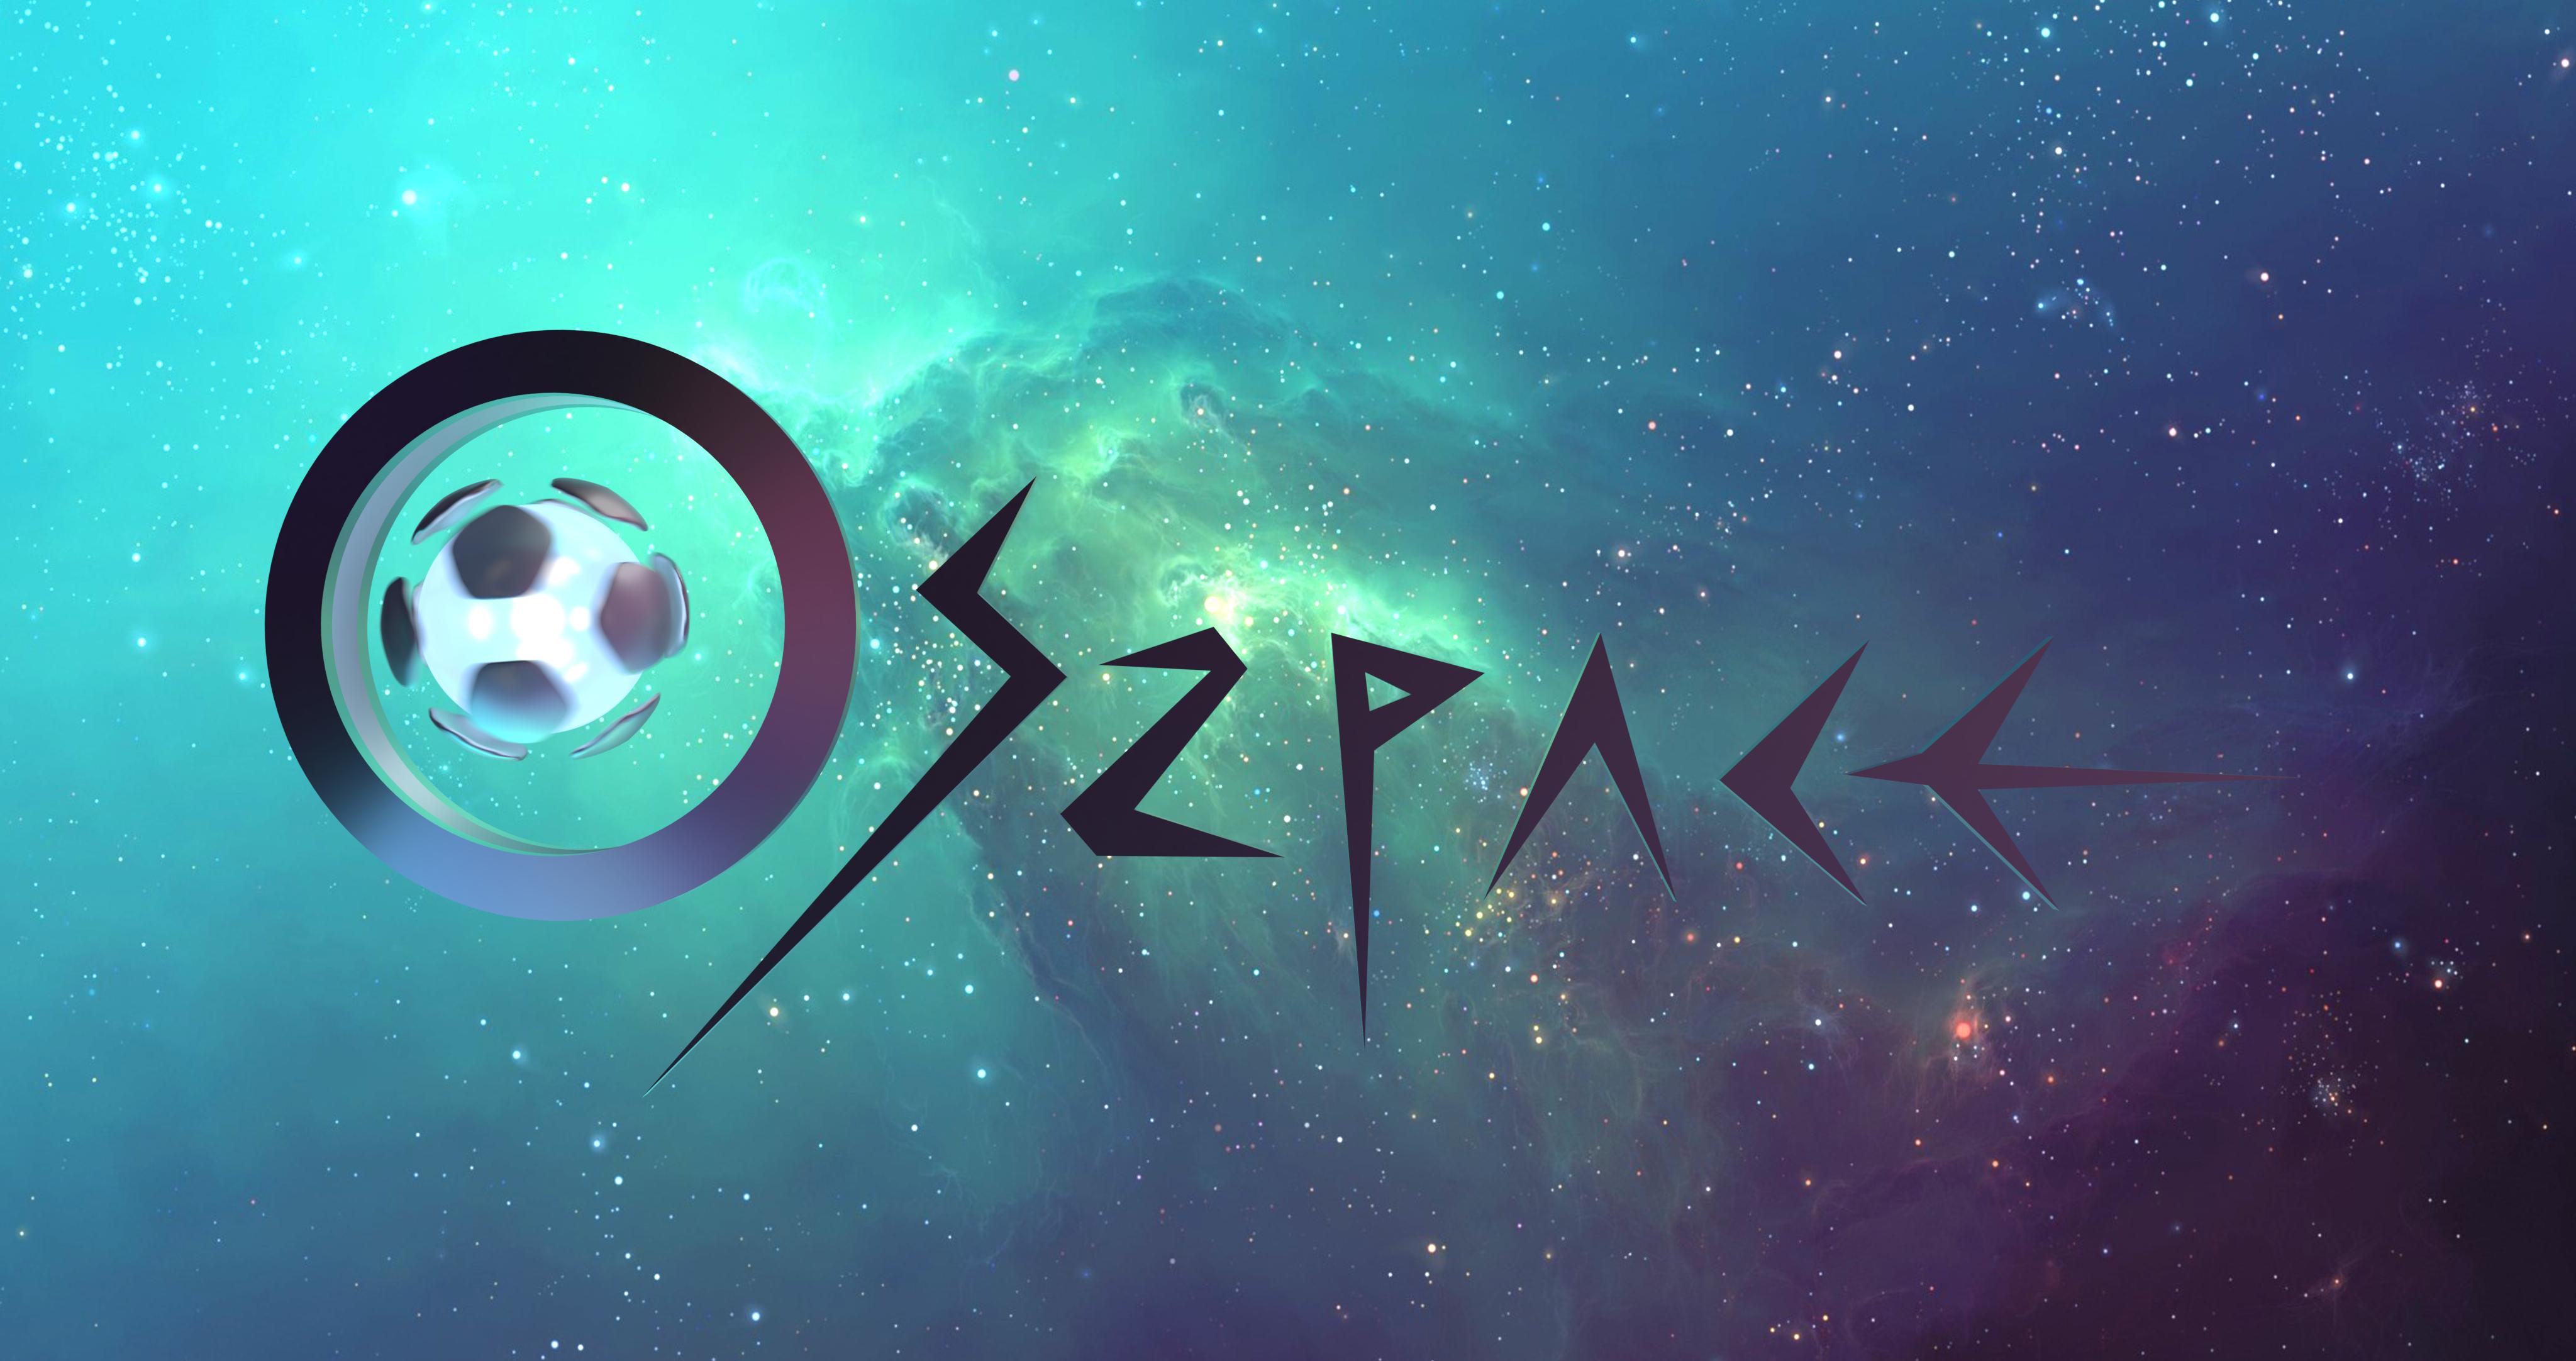 OSzpace